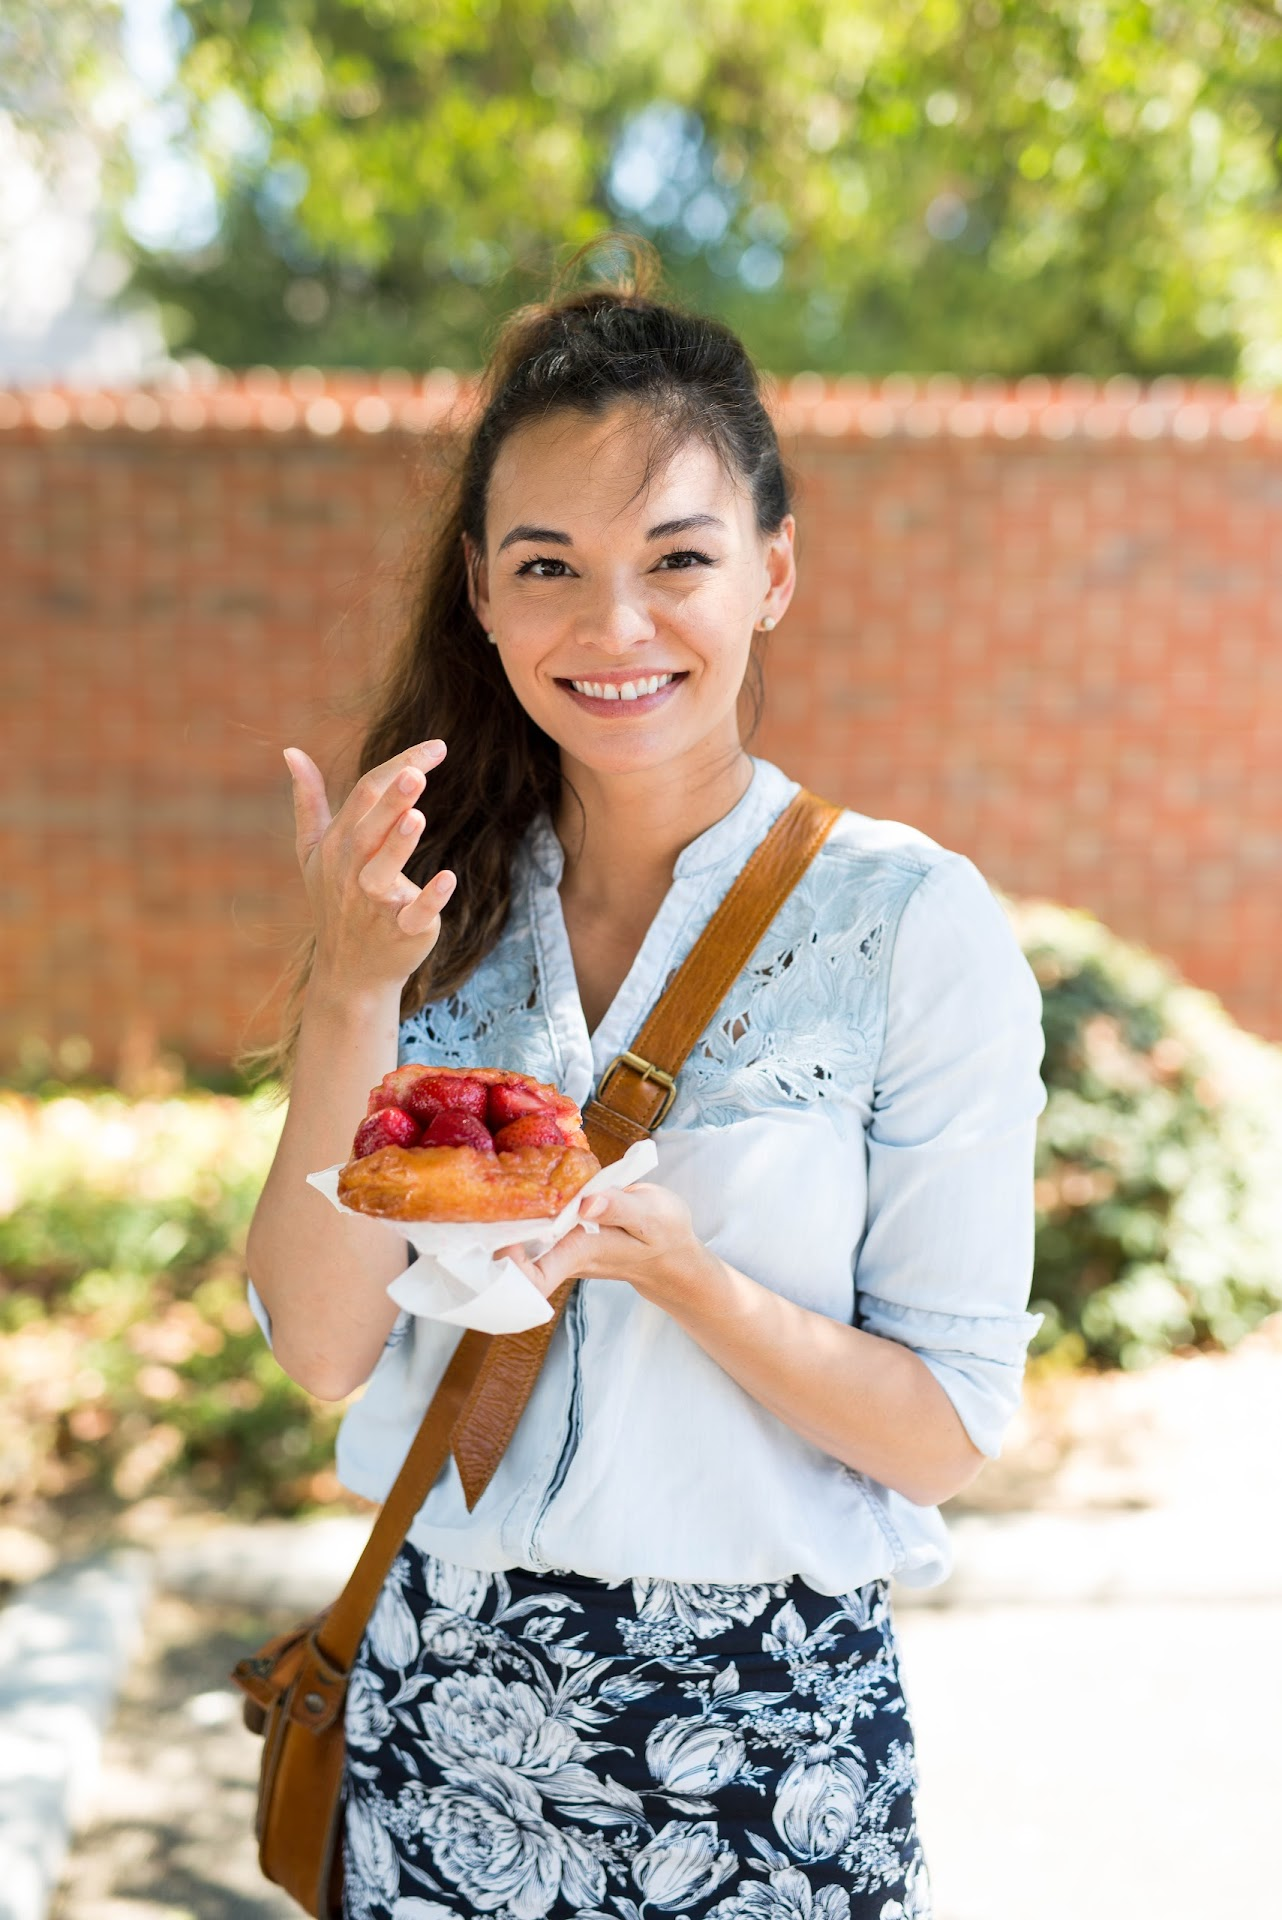 california food blogger, best donuts review, doughnuts, the donut man glendora, strawberry donut, famous, asian, korean, japanese, lds mormon, la food reviews